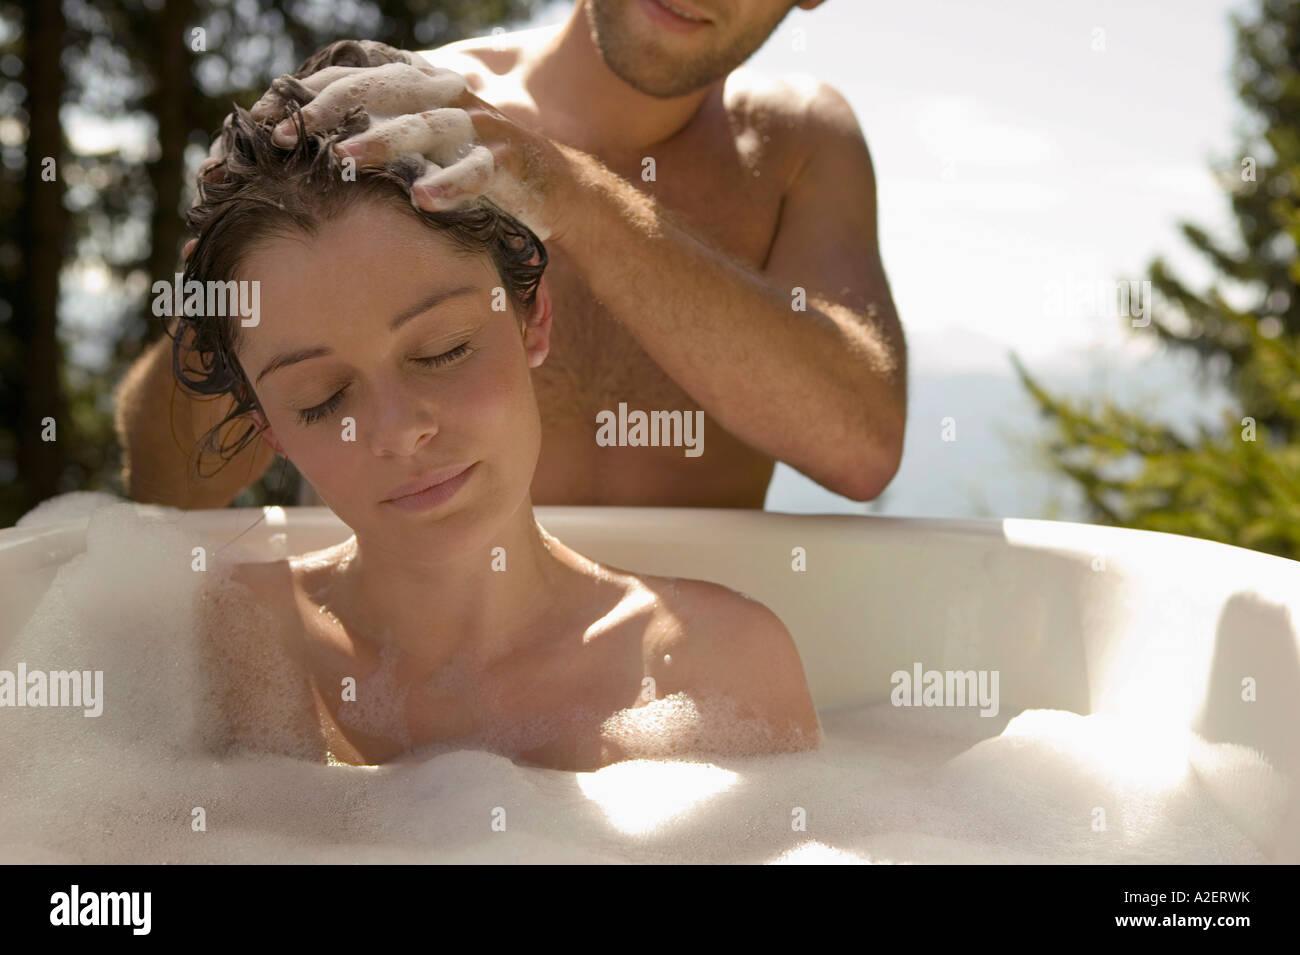 Young woman lying in bathtub, young man washing hair - Stock Image